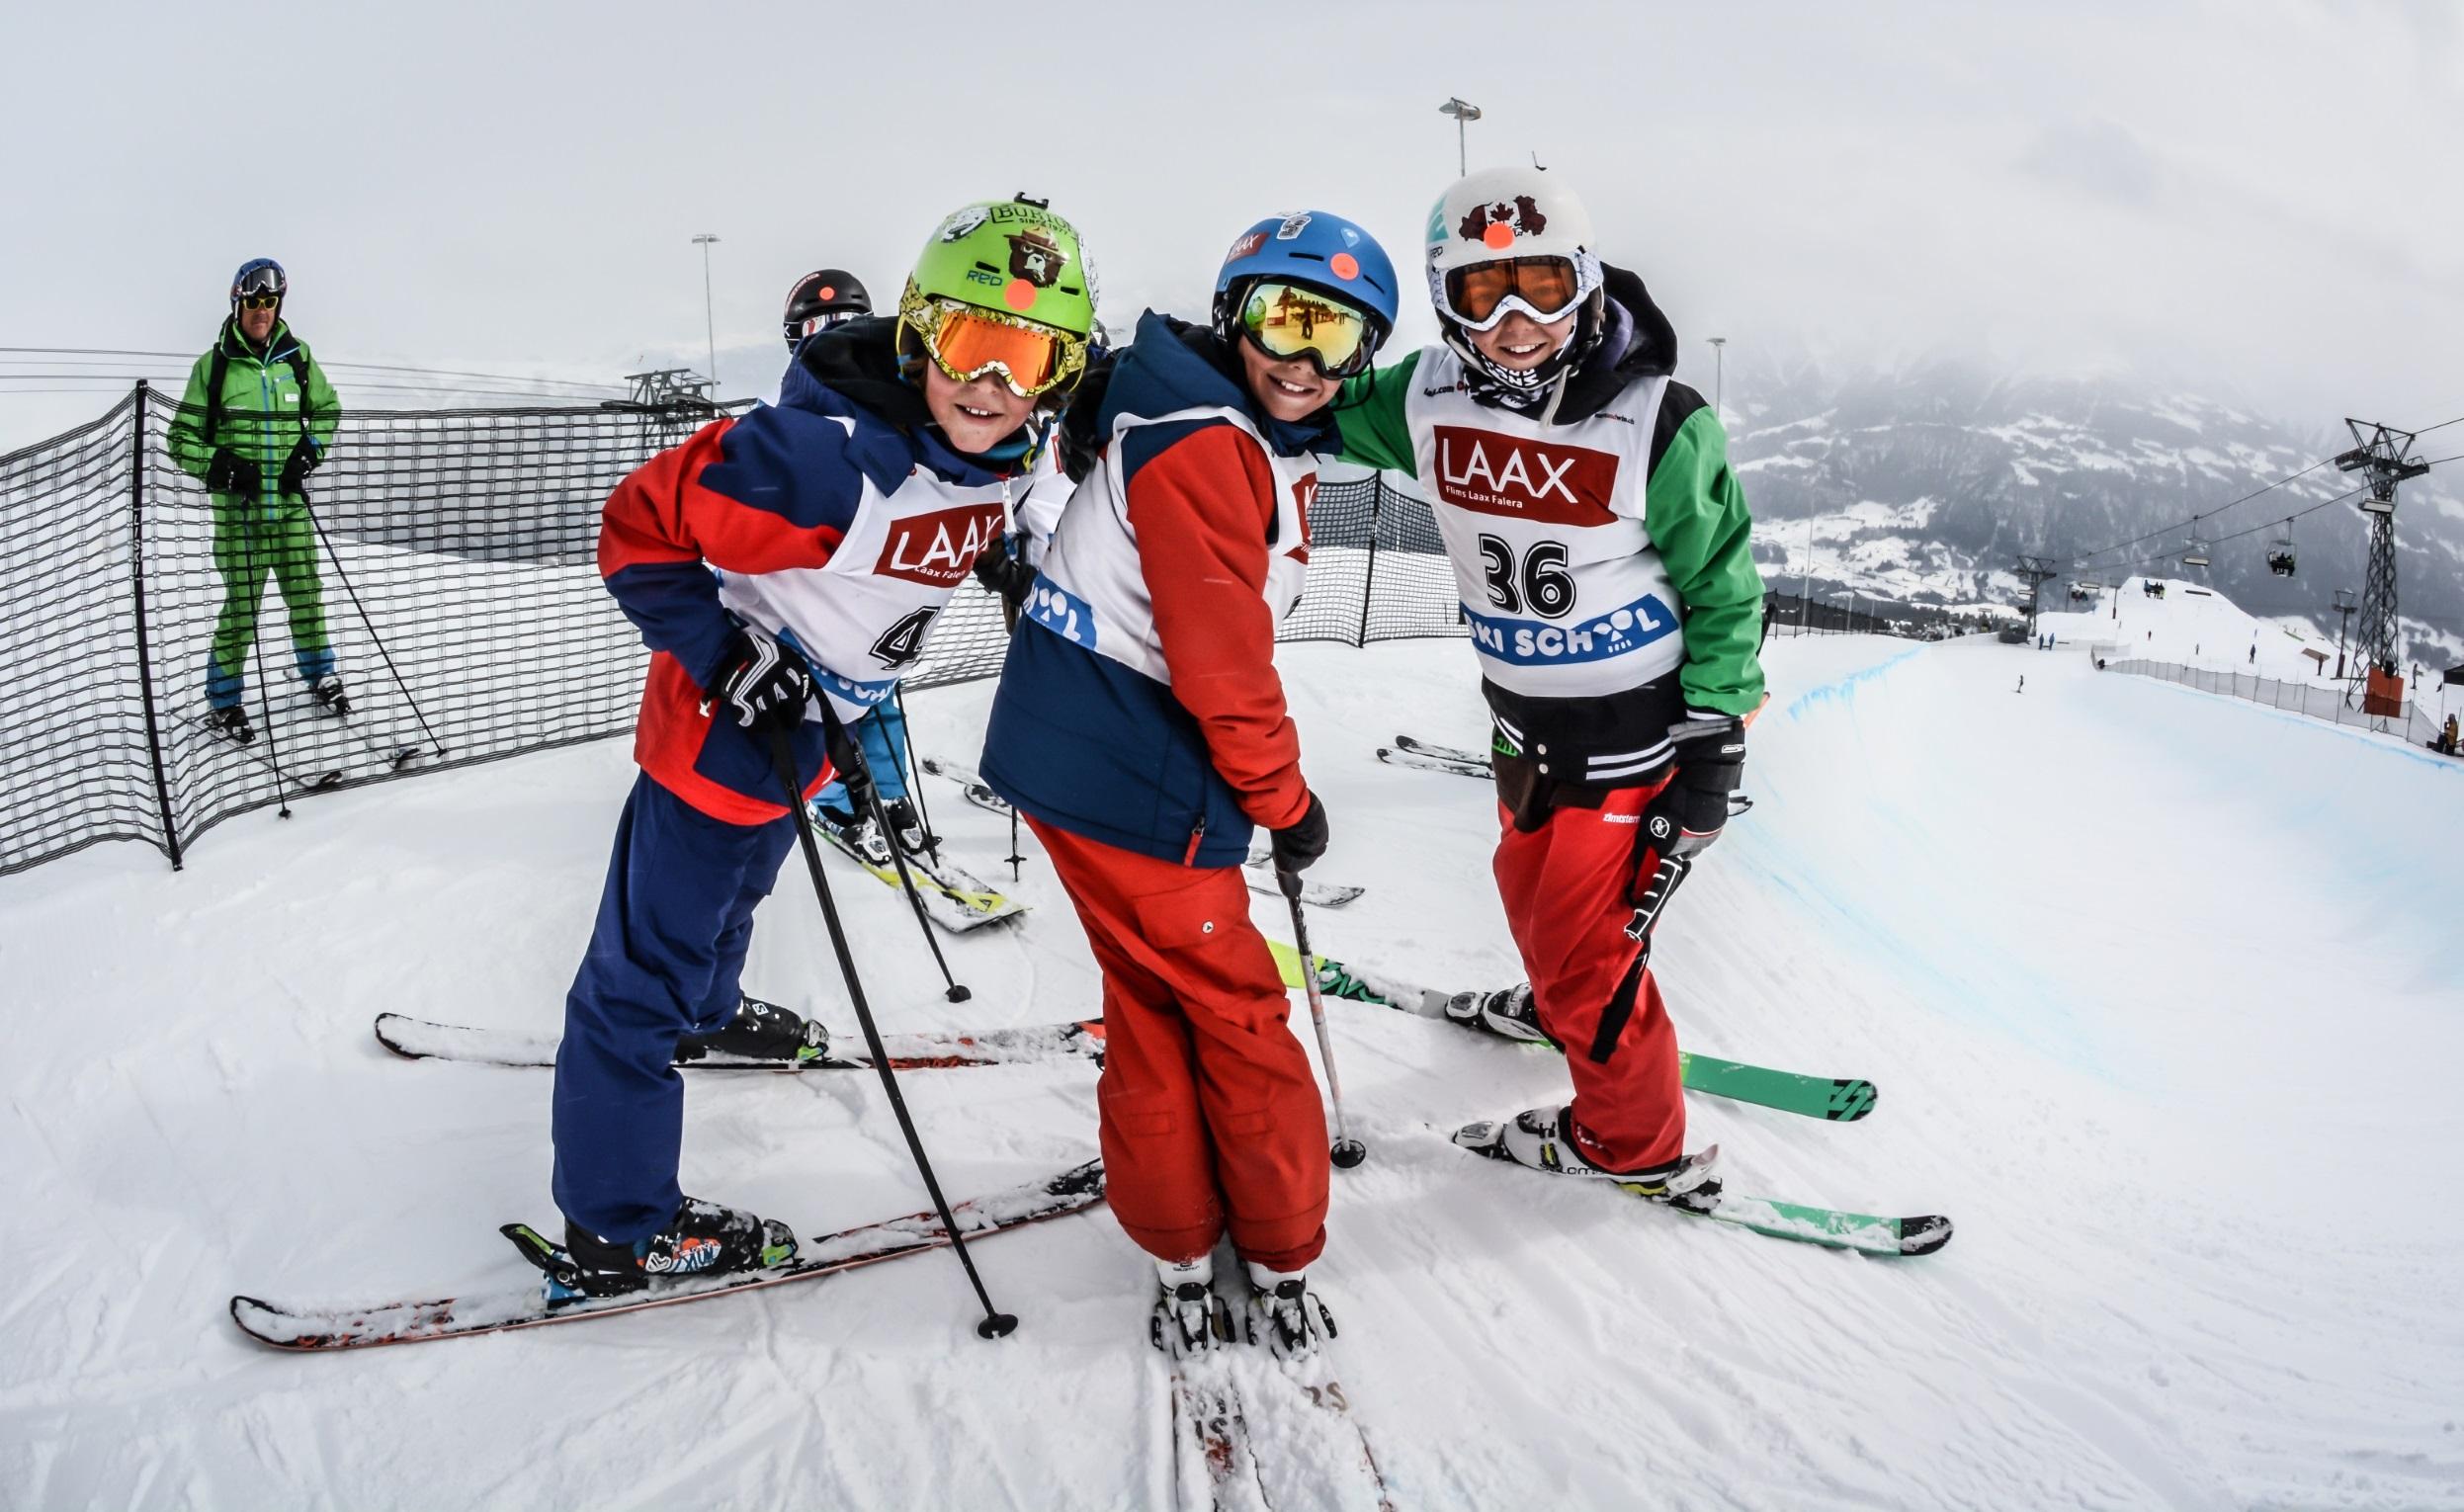 LAAX_Mini Shred Contest_Trio(c) Daniel Ammann